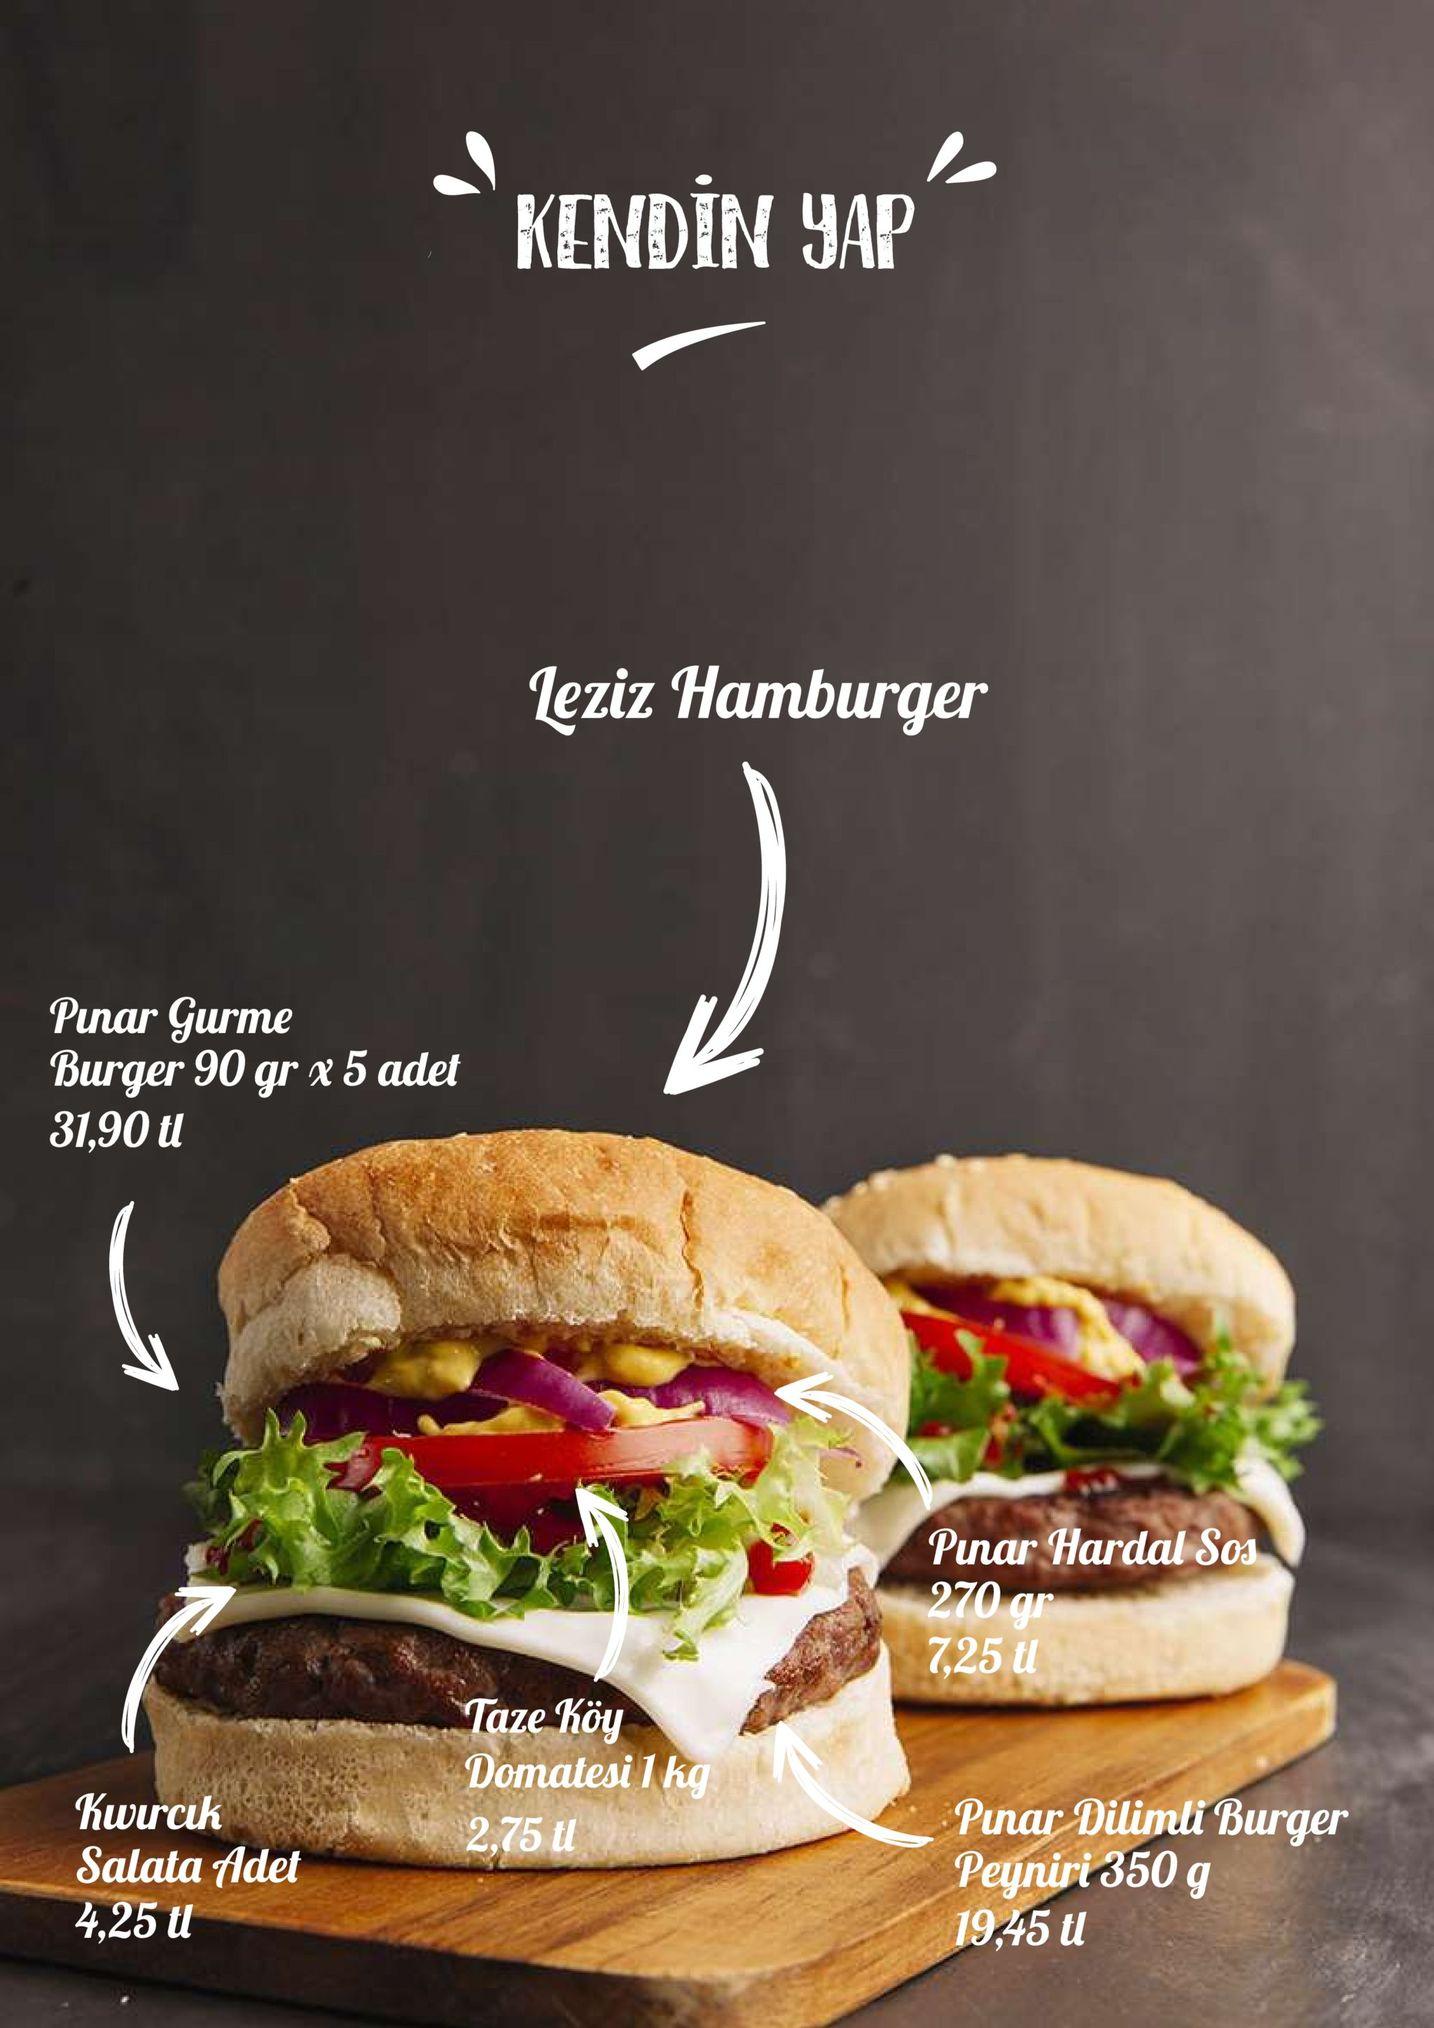 kendin uap leziz hamburger pinar gurme burger 90 gr 31,90 tl 5 adet pnar hard ,25 aze оч domatesi l hg 2,75 kwrcak salata fldet 4,25 u pnali burger peyniri 850 g 19,45 u lul